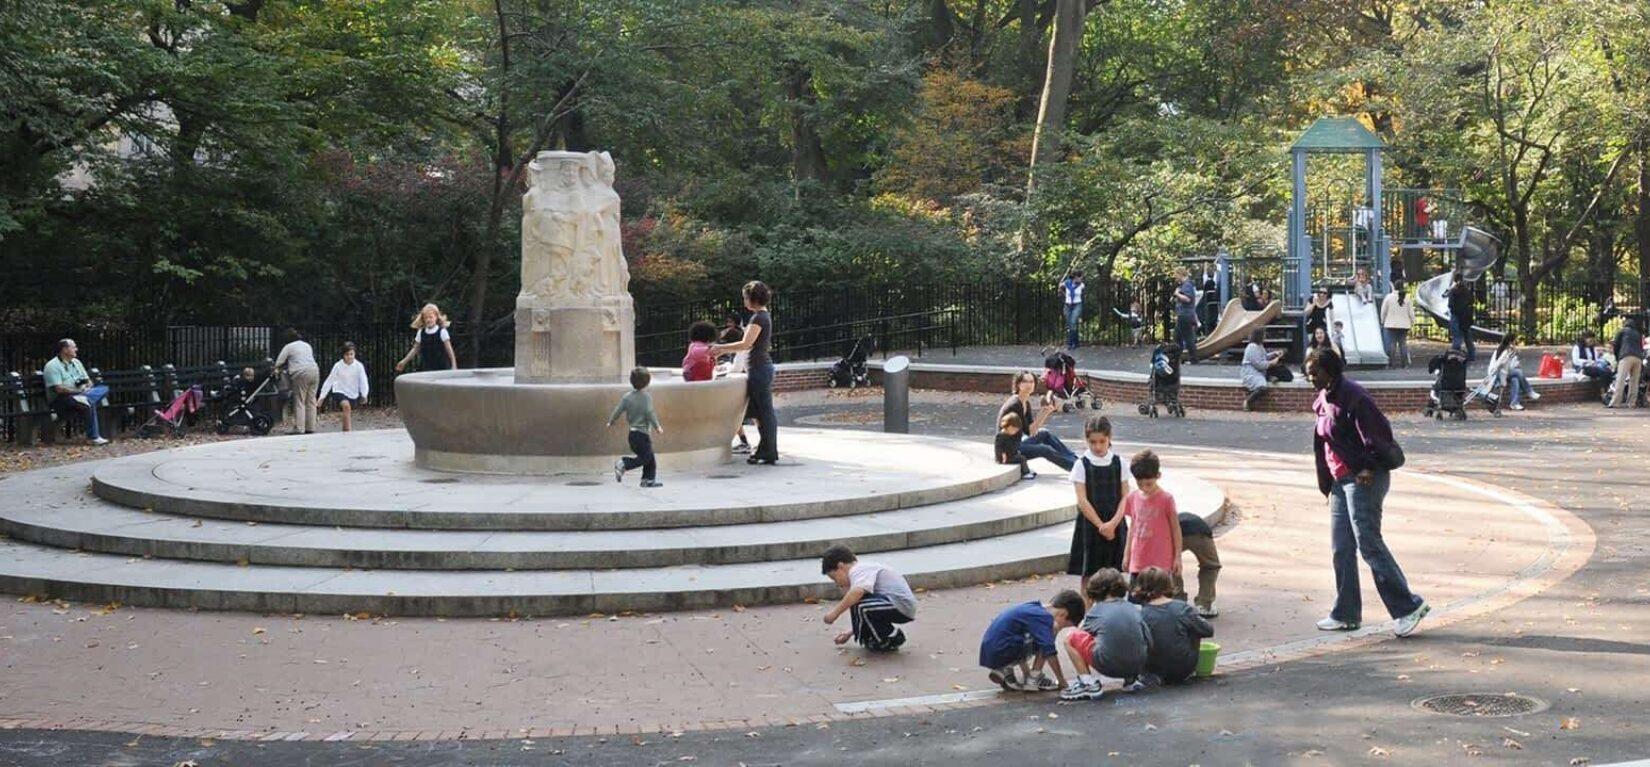 Ff wide 2x Sophie Loeb Fountain 2